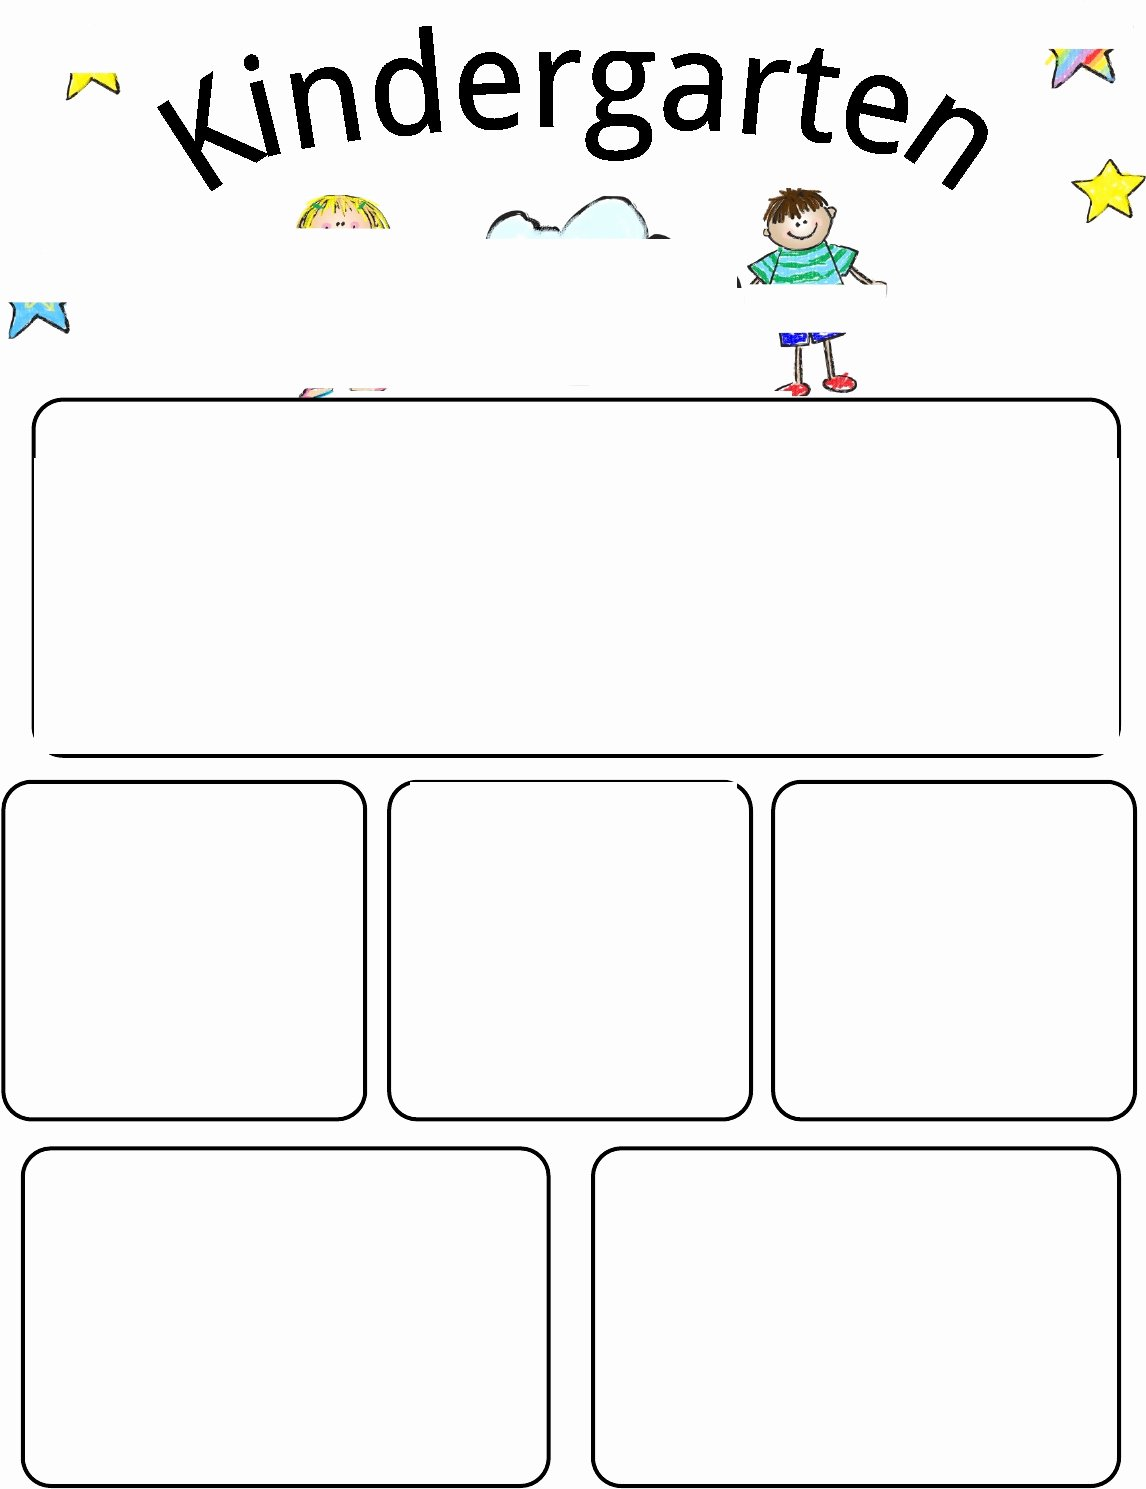 Preschool Newsletter Templates Free Inspirational Kindergarten Newsletter Template Free